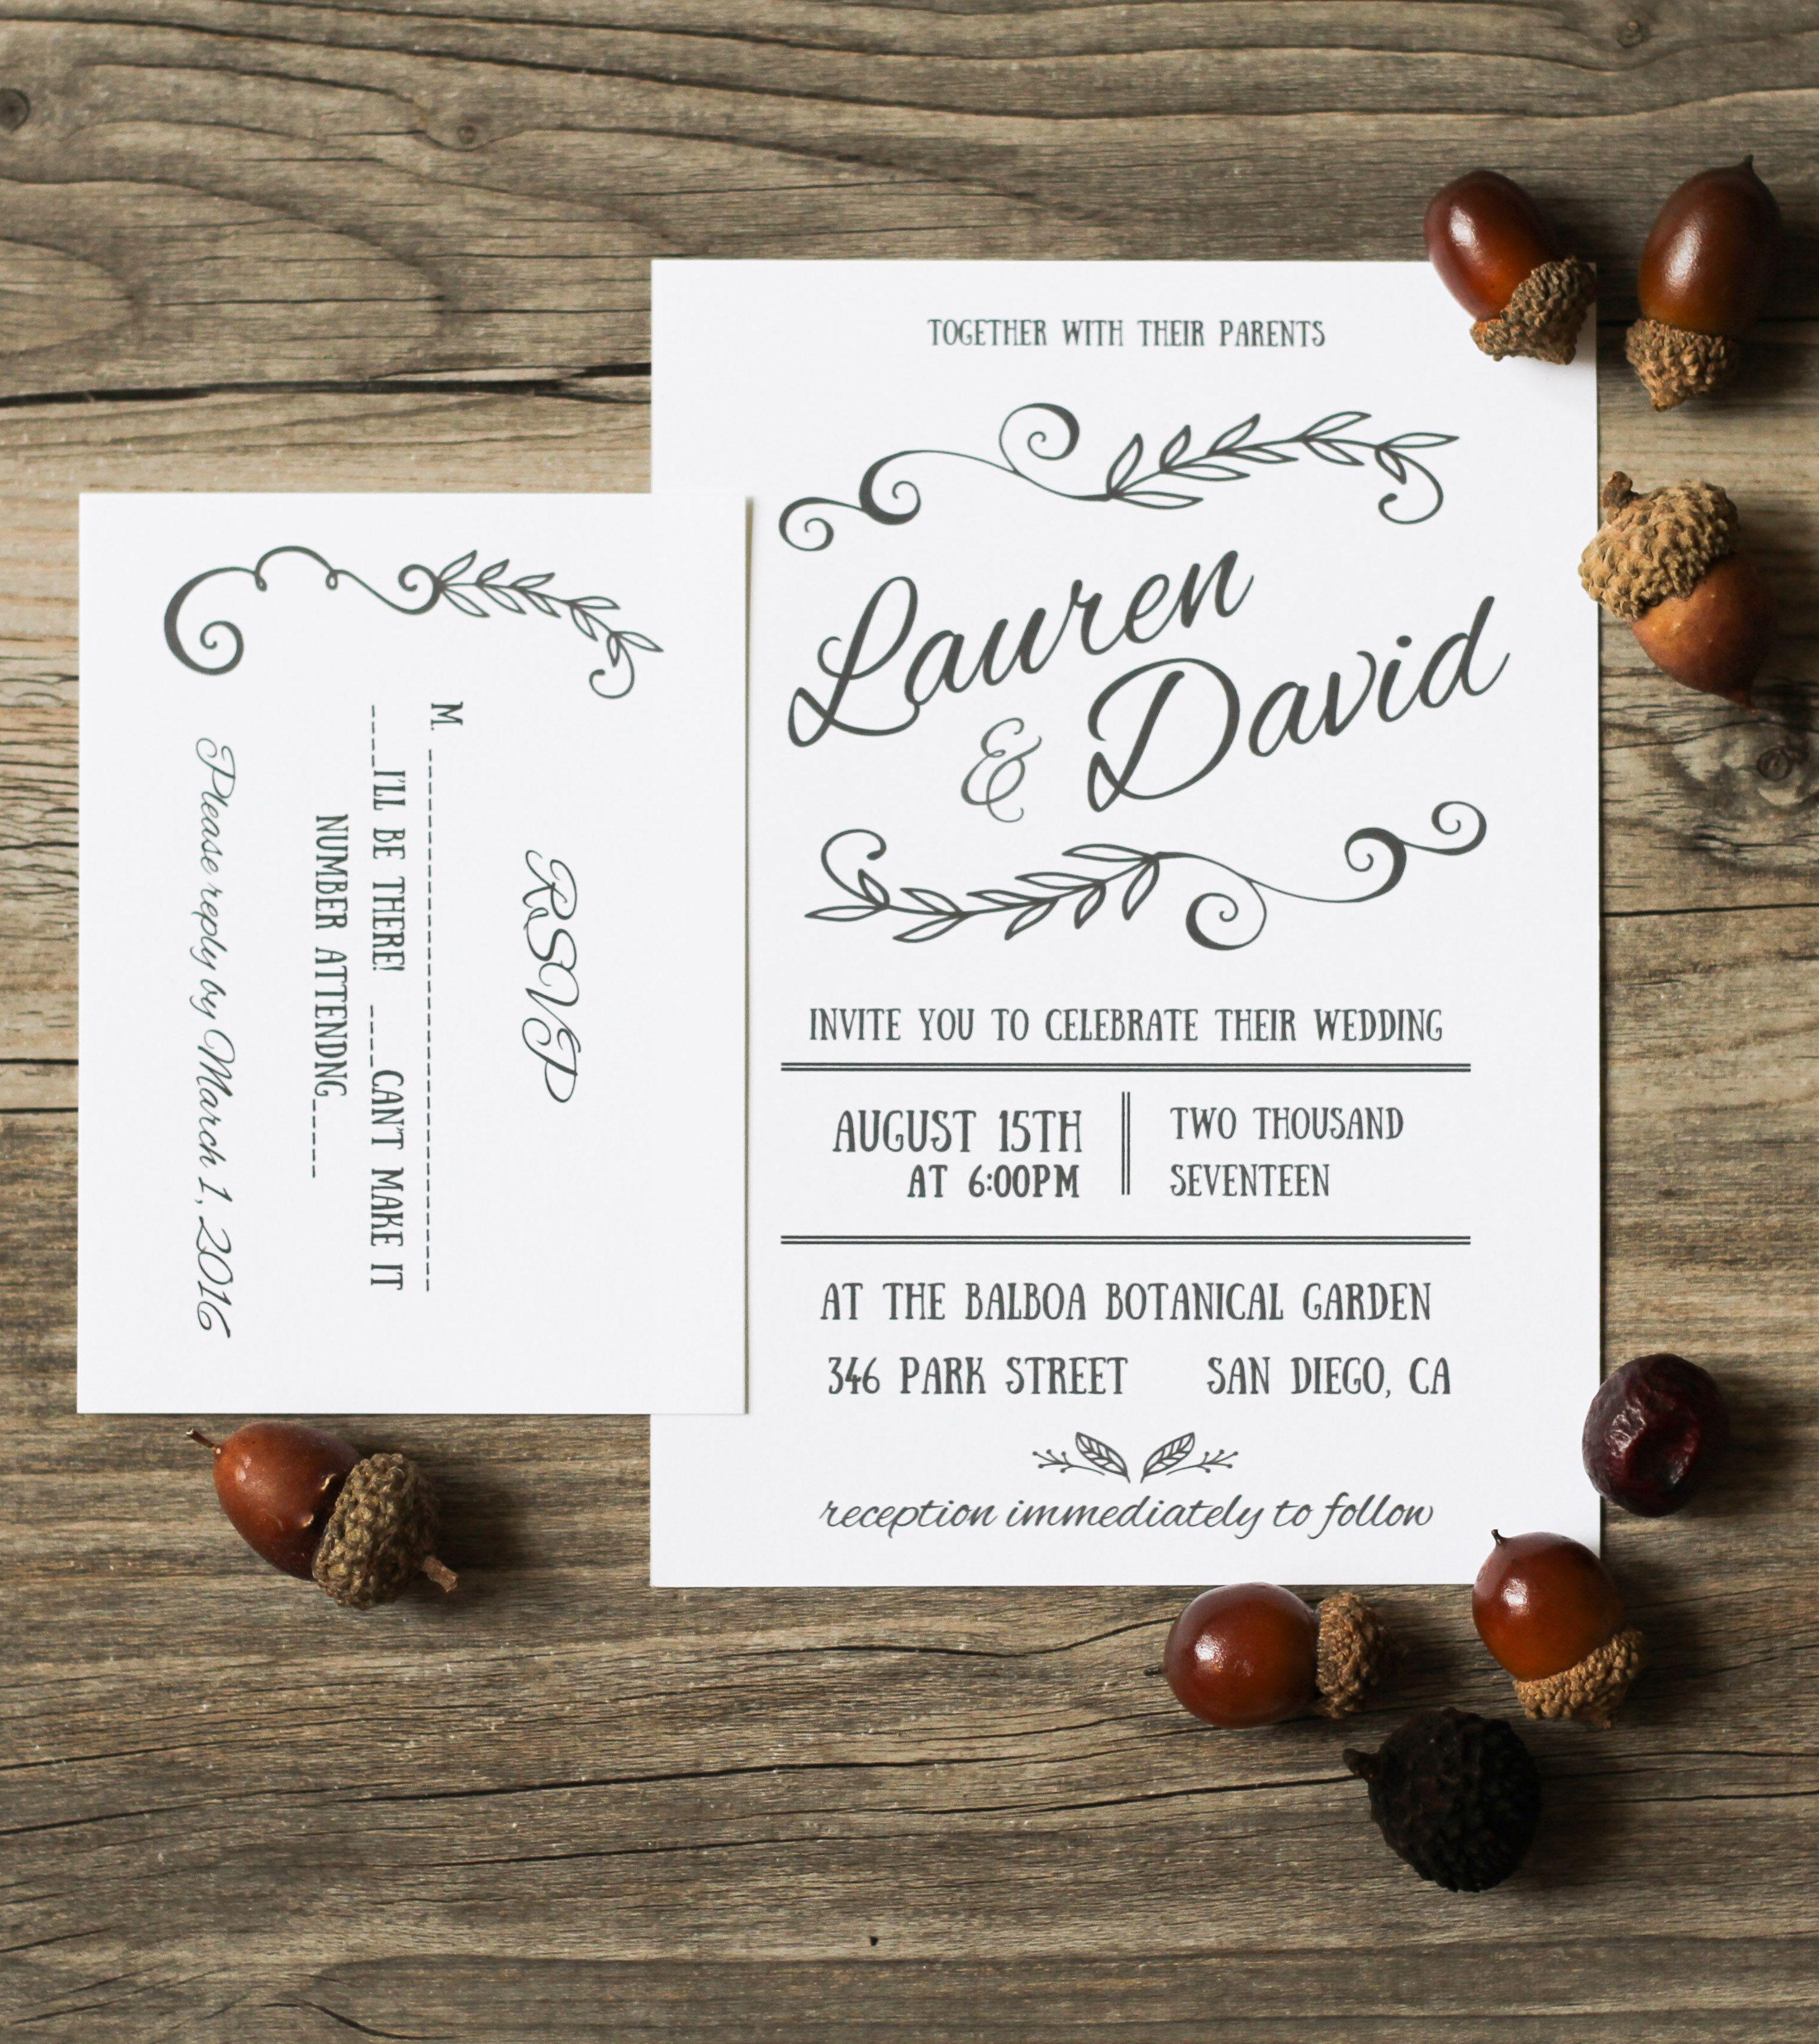 001 Sensational Microsoft Office Wedding Invitation Template Picture  Templates MFull